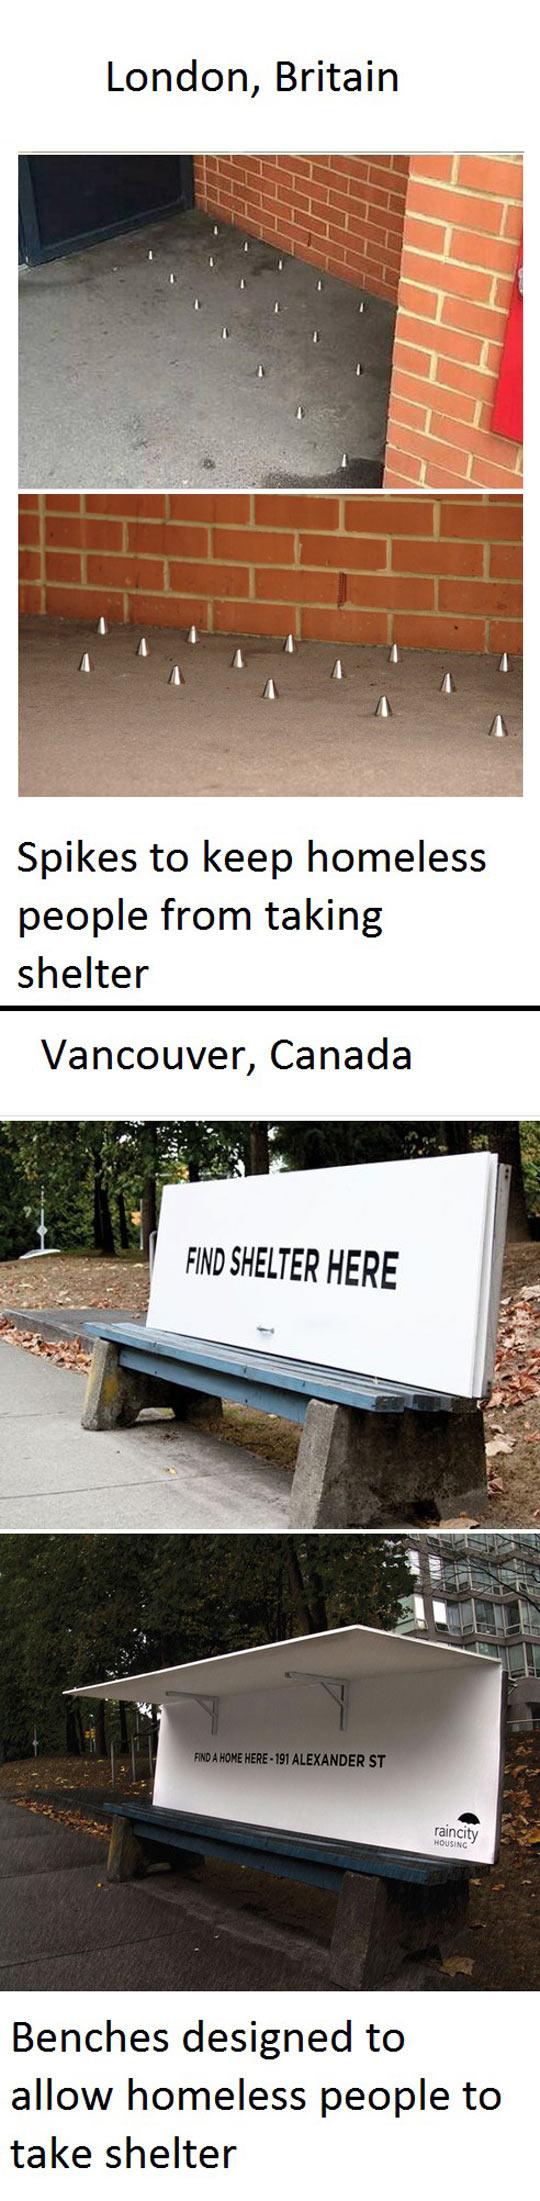 funny-London-homeless-Canada-shelter